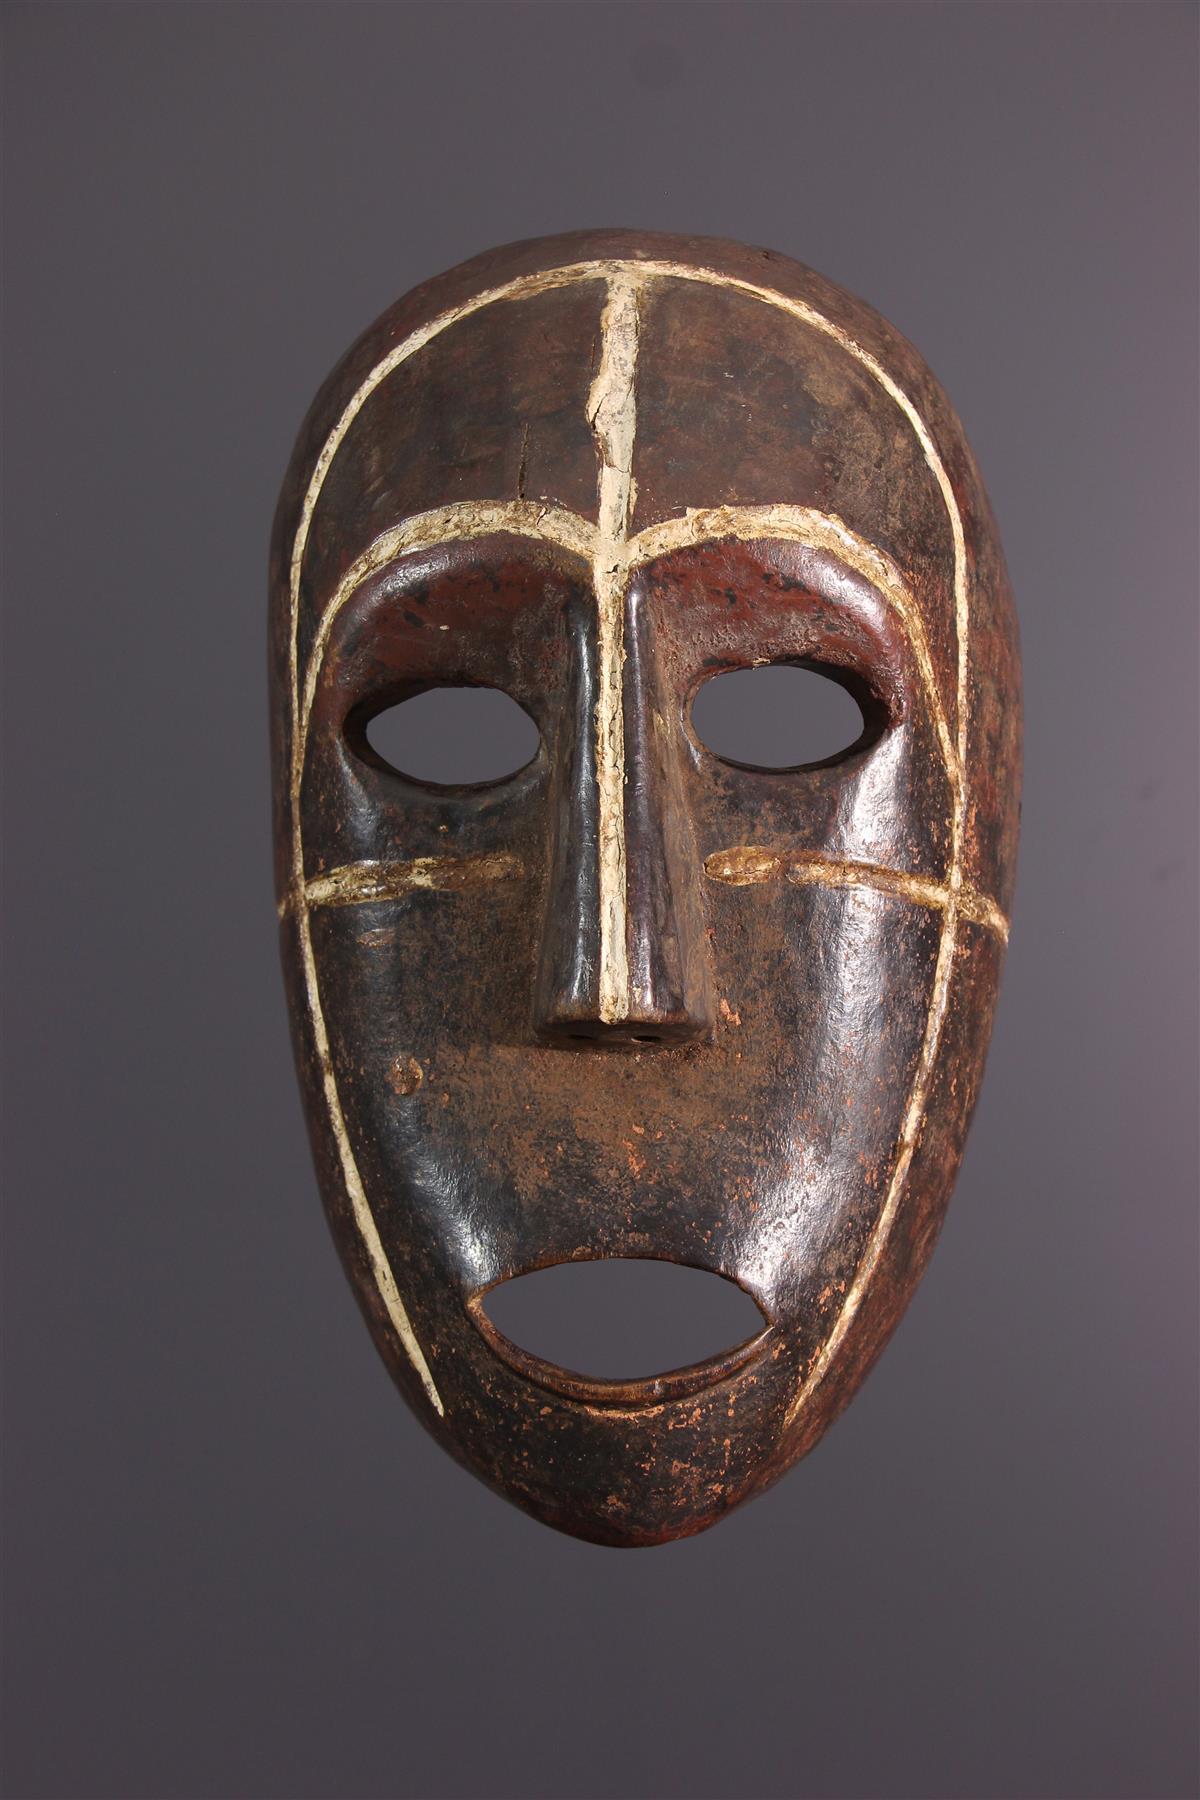 Masque Ziba - Tribal art